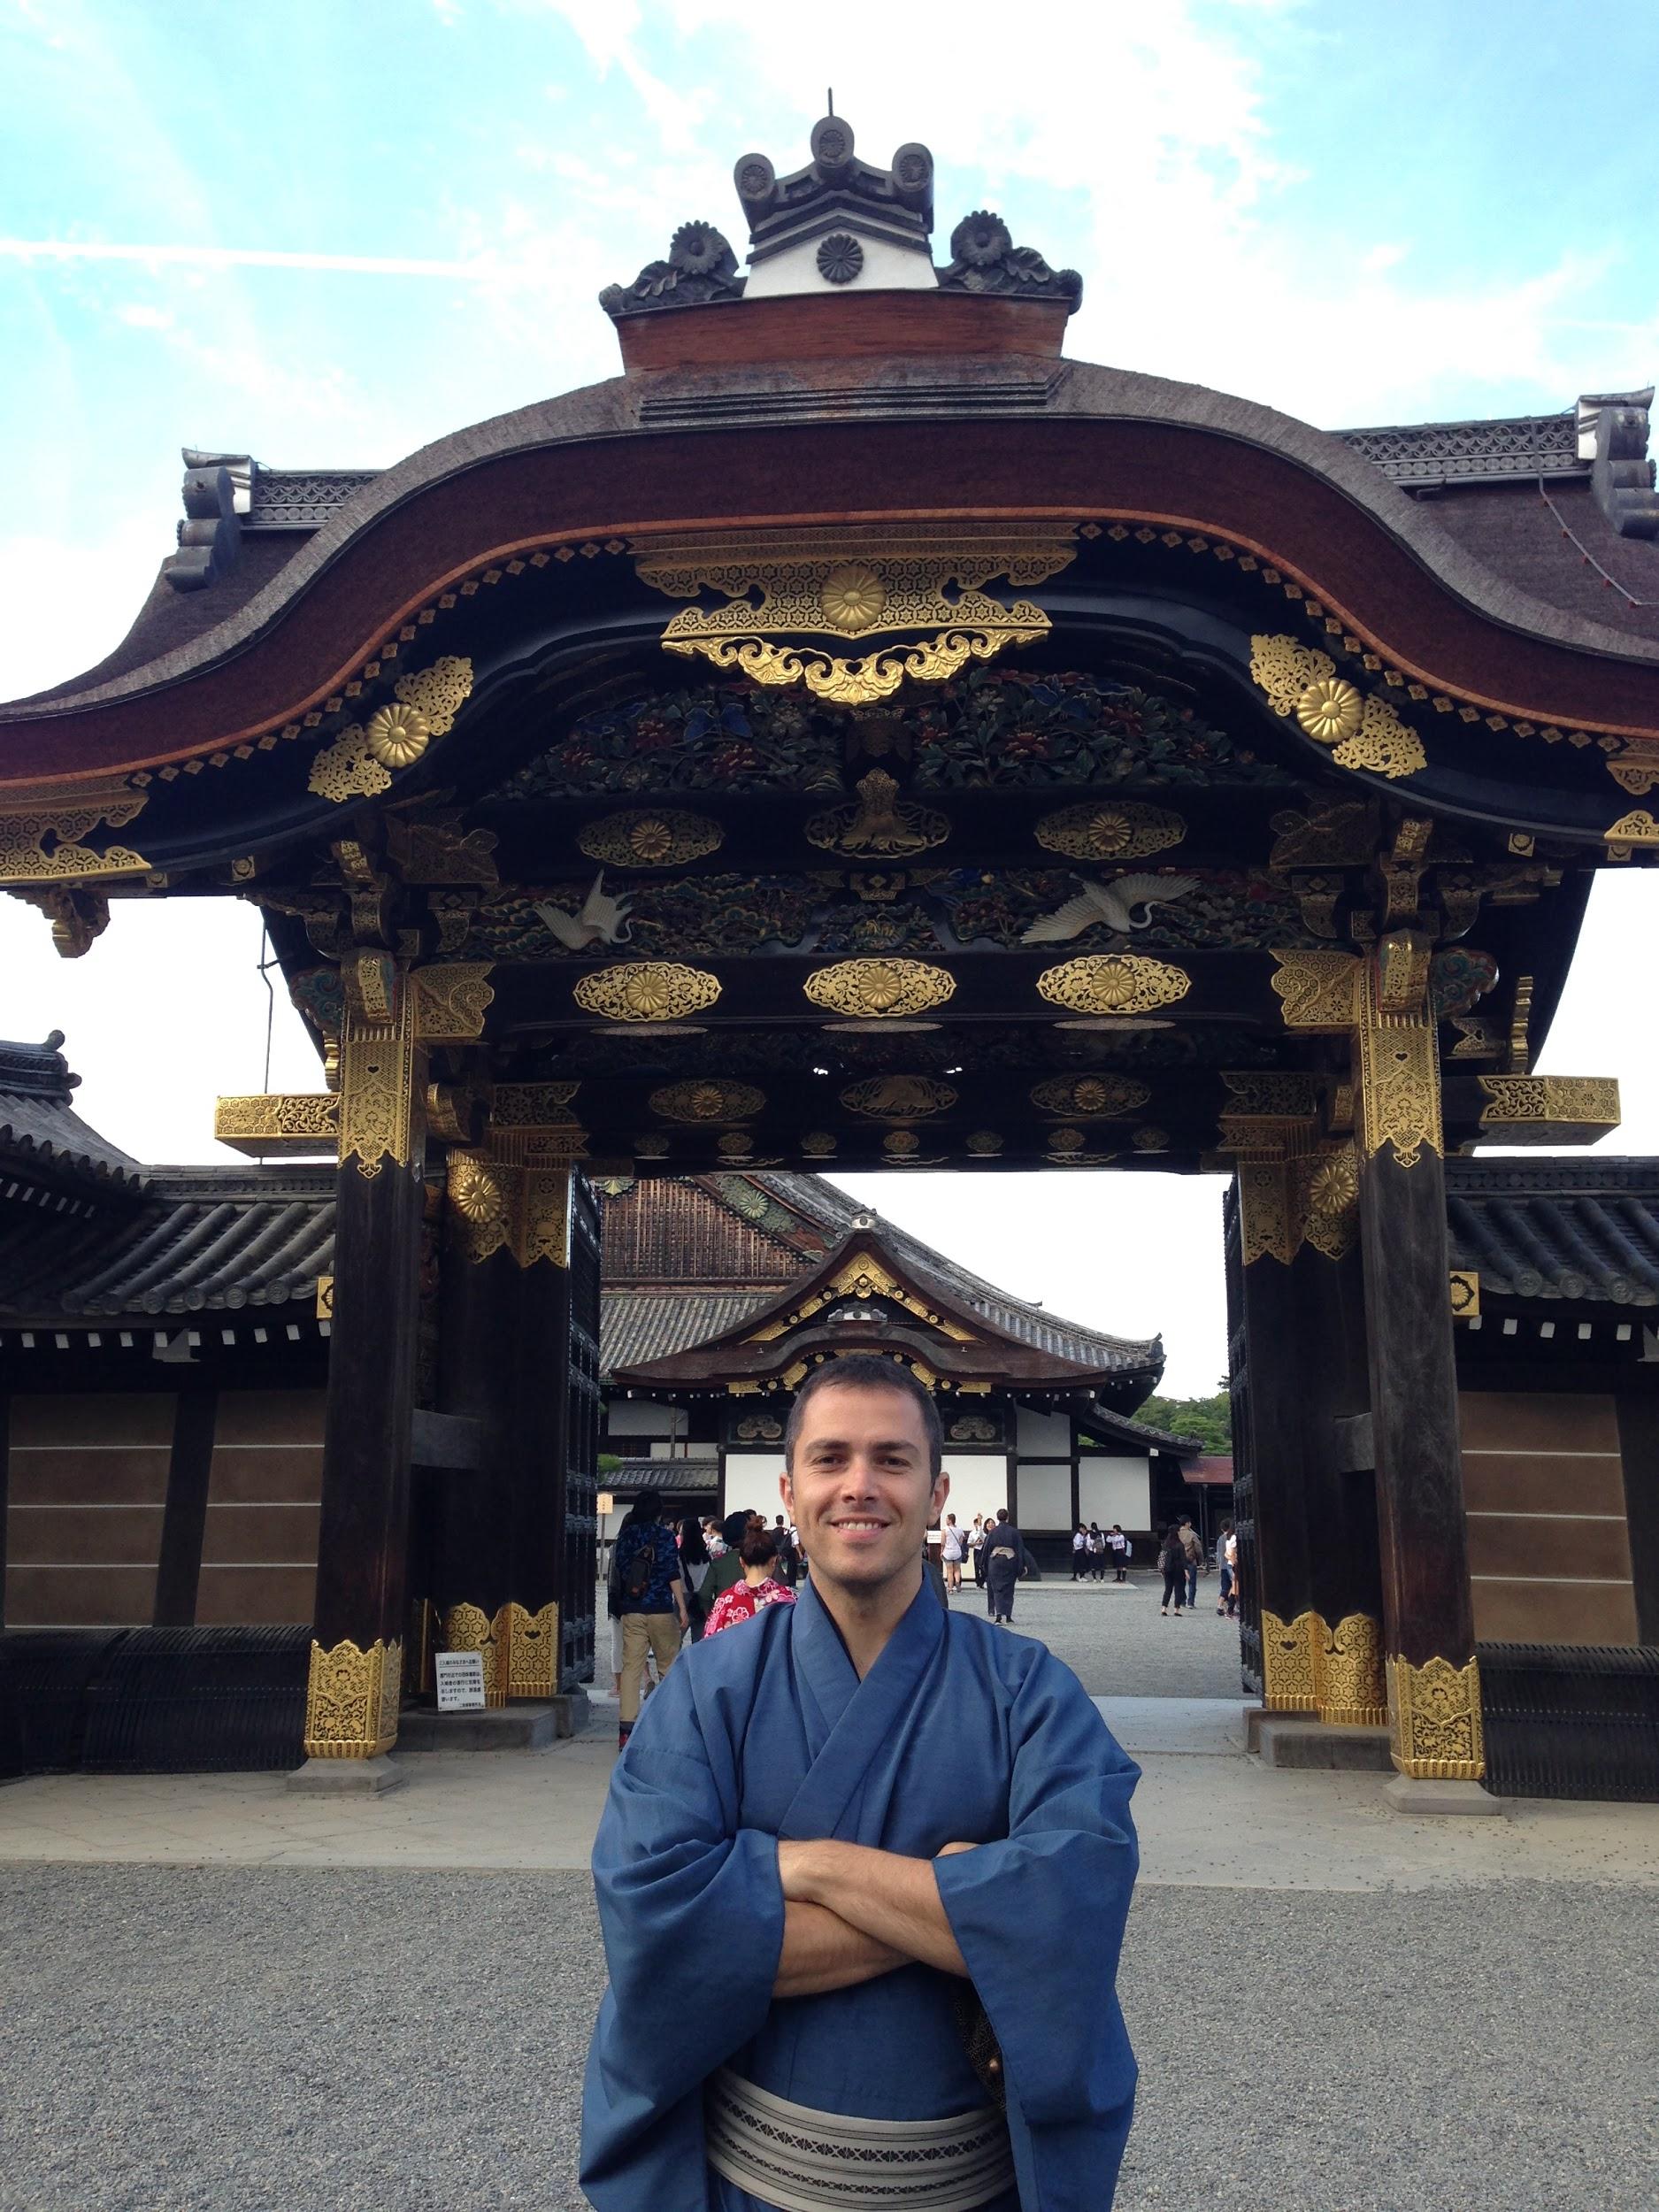 Pete at Kinkaku-ji - Golden Pavilion